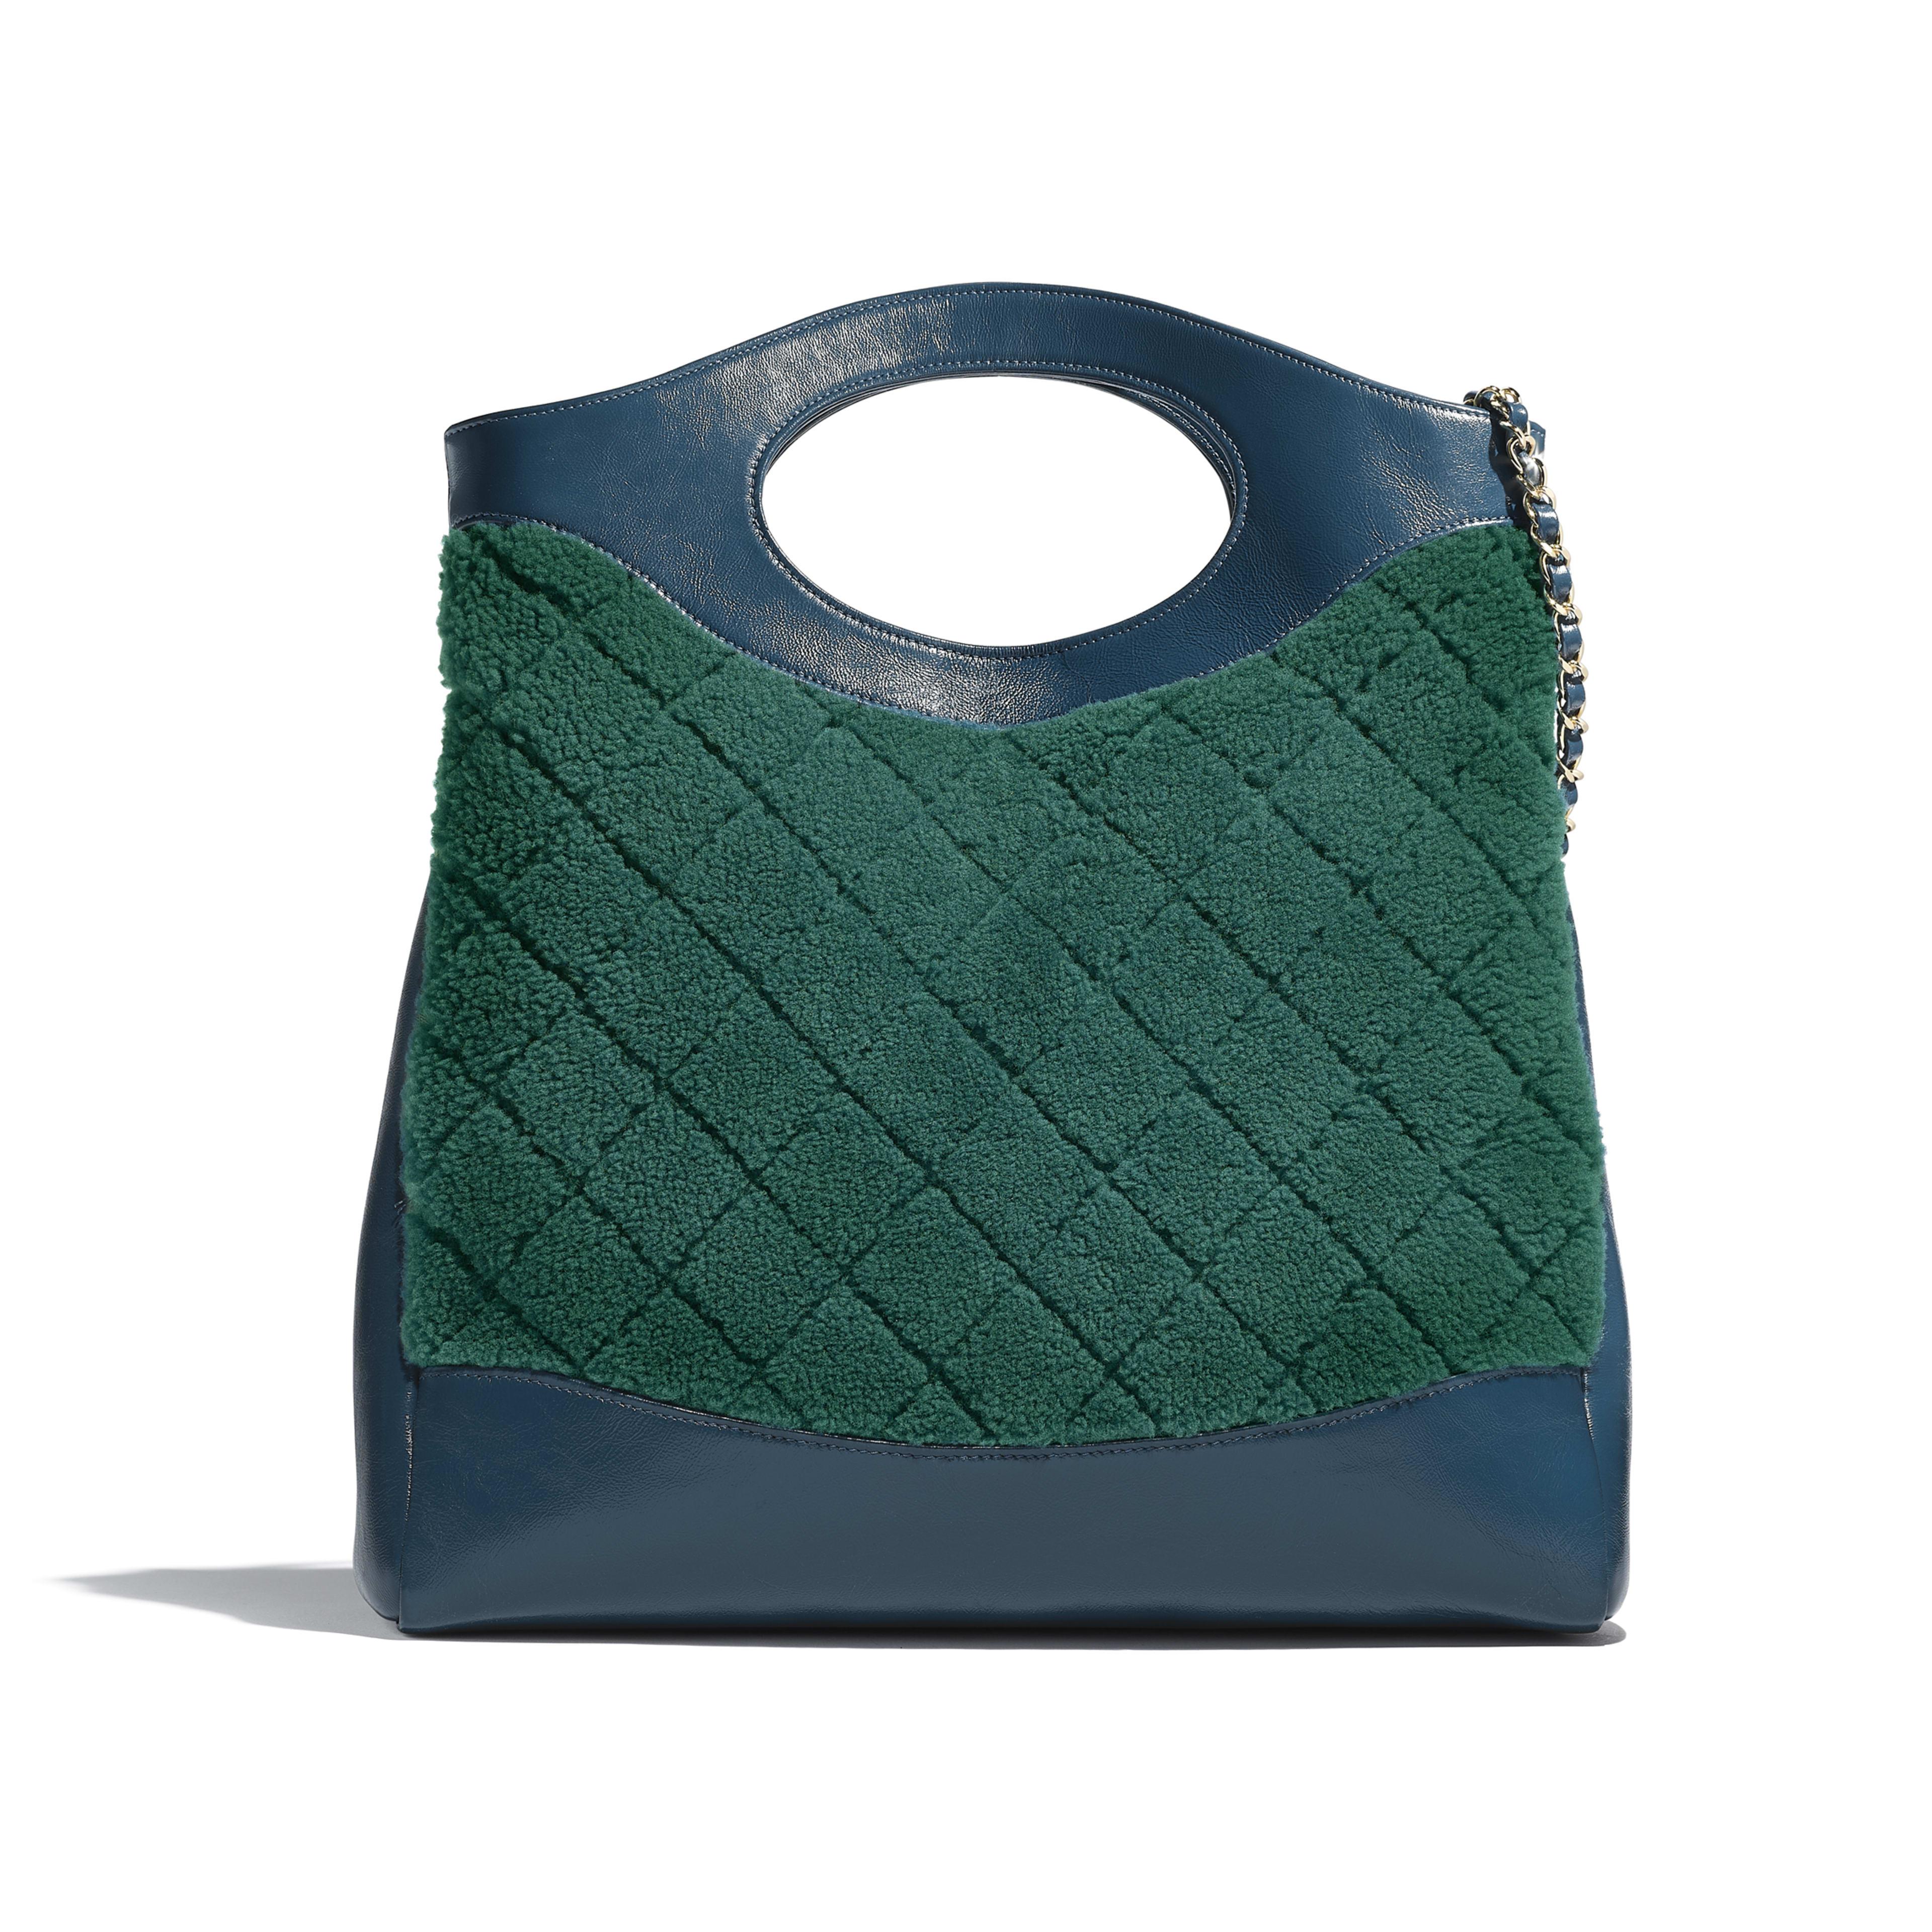 CHANEL 31 Shopping Bag - Green & Blue - Shearling Sheepskin, Calfskin & Gold-Tone Metal - Alternative view - see full sized version